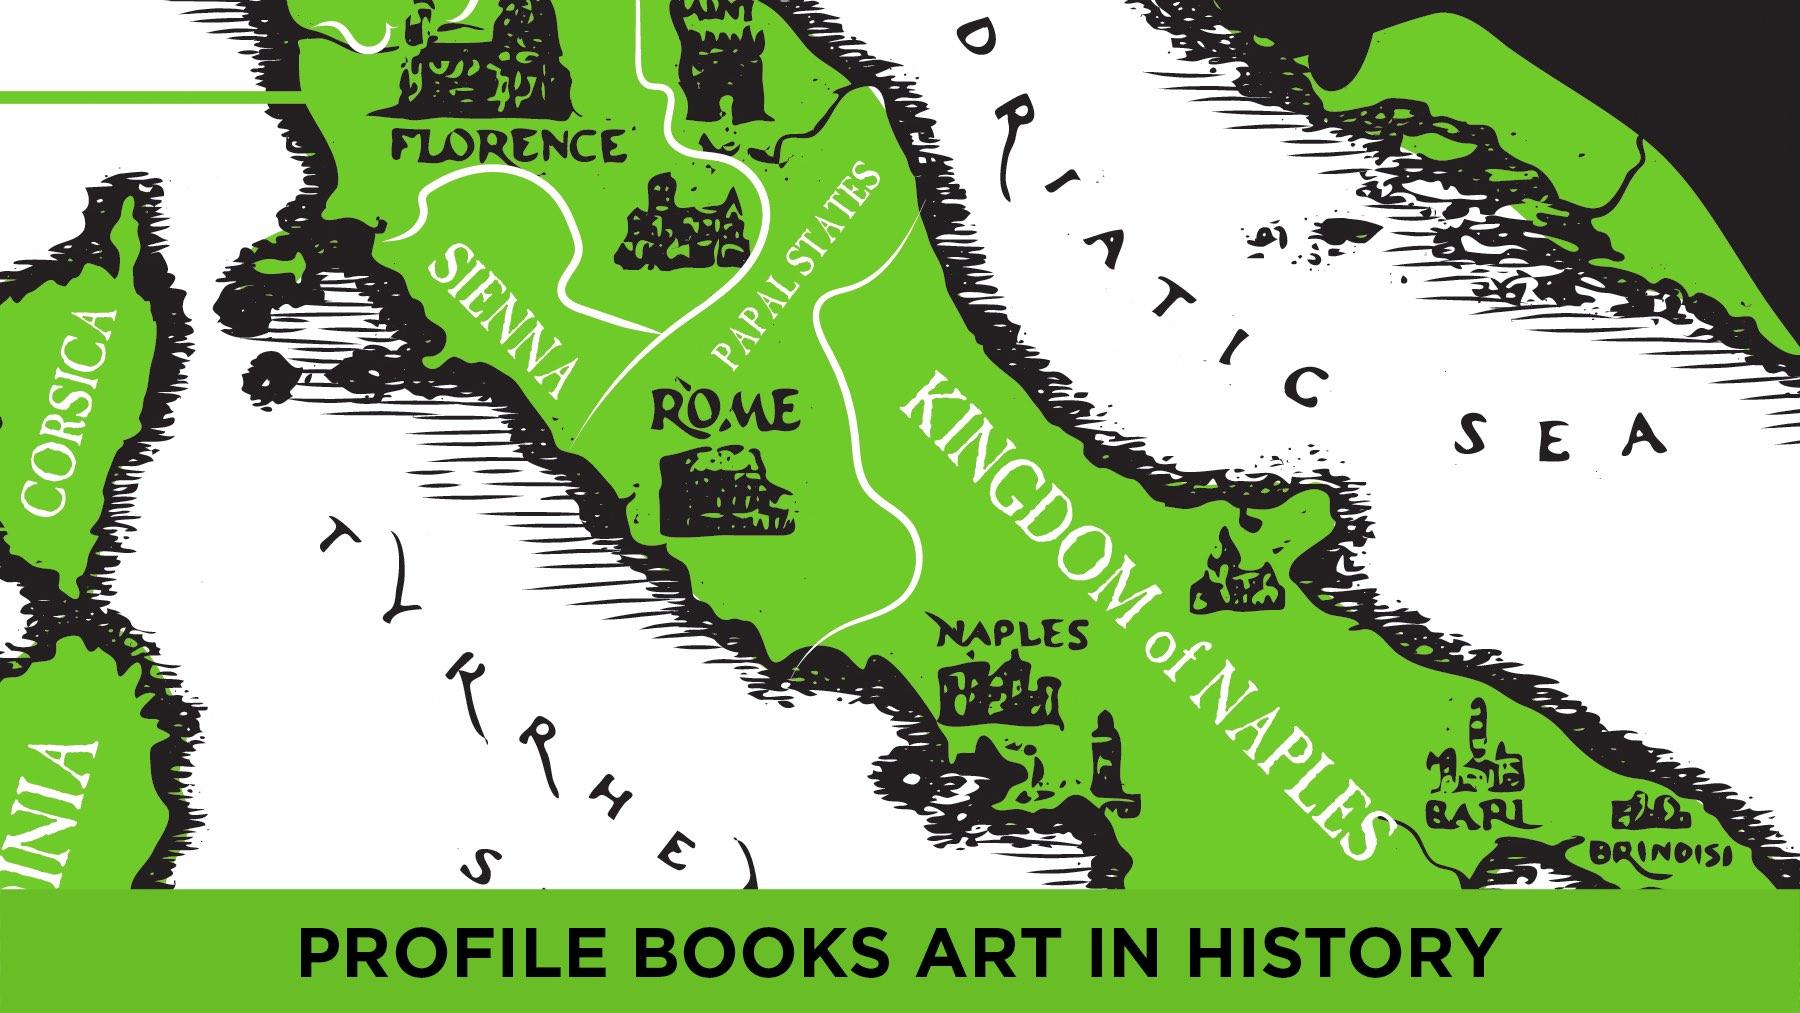 profile-books-art-in-history-illustration-cognitive-01.jpg